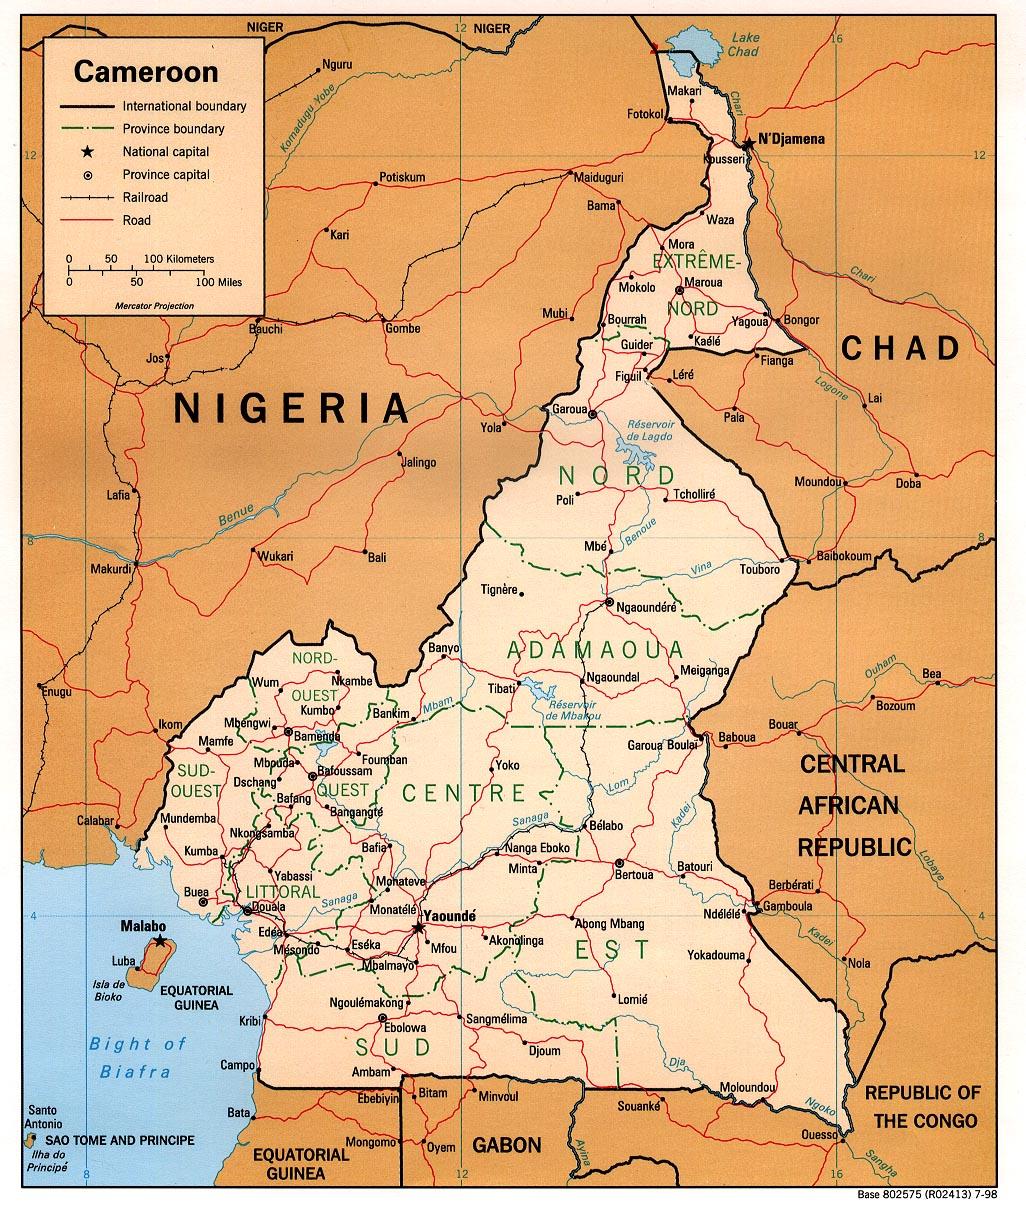 Map of Cameroon (Political Map) : Worldofmaps.net - online ...